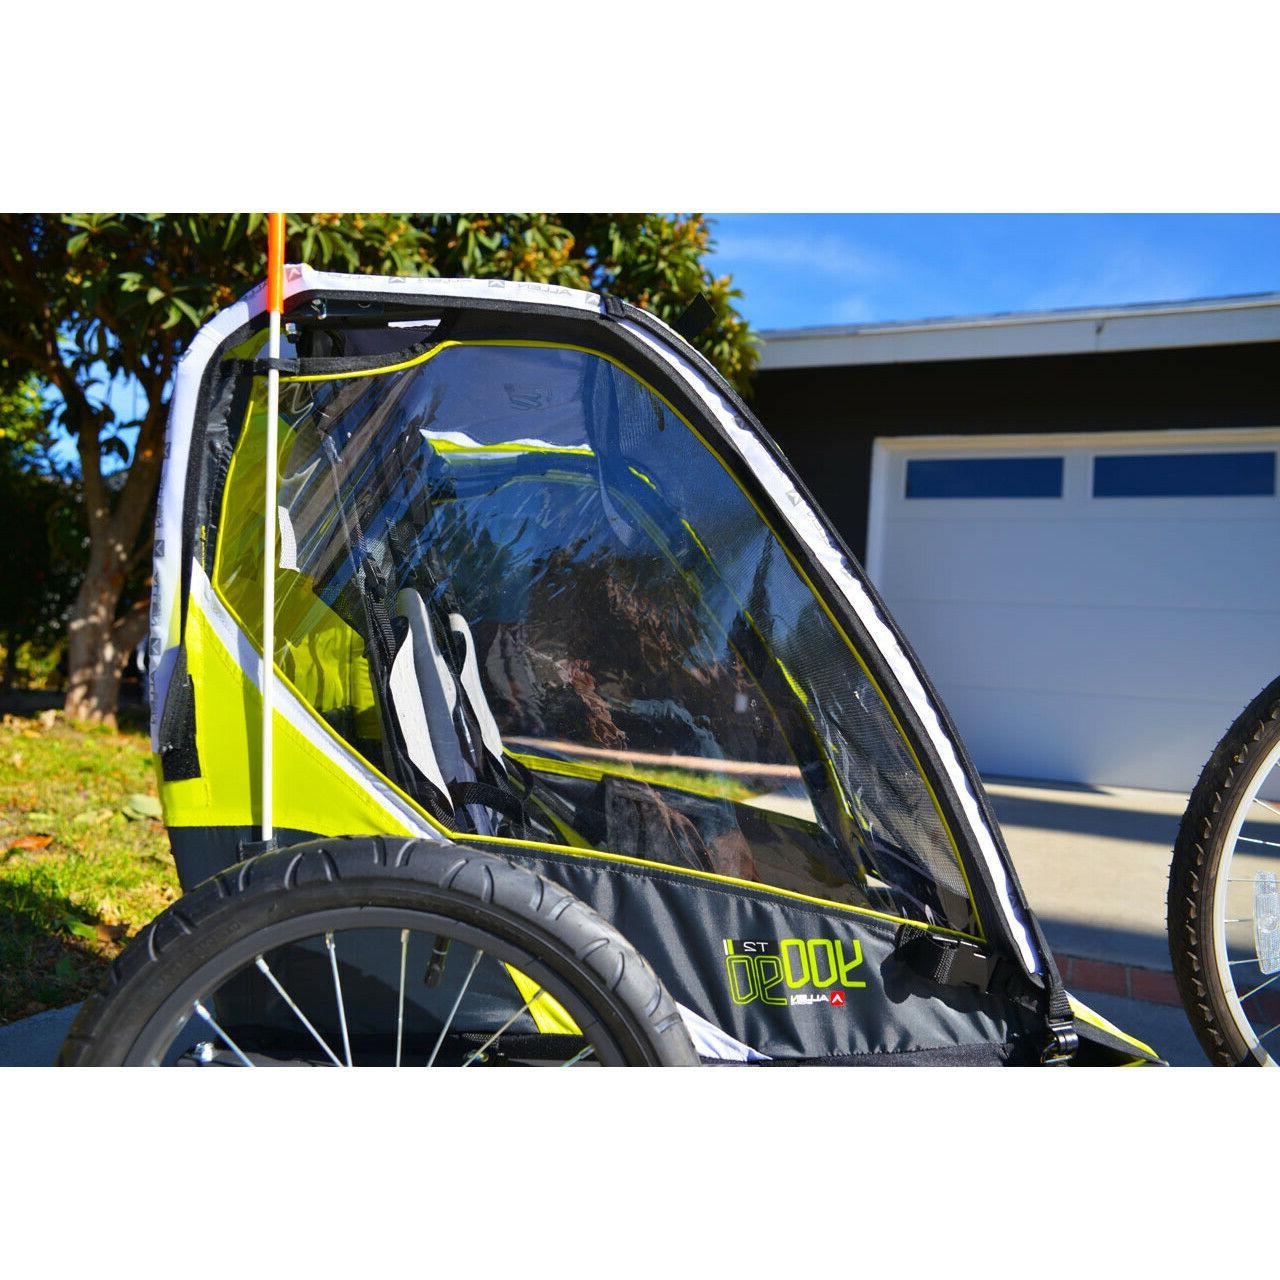 allen sports deluxe 2 child bike trailer